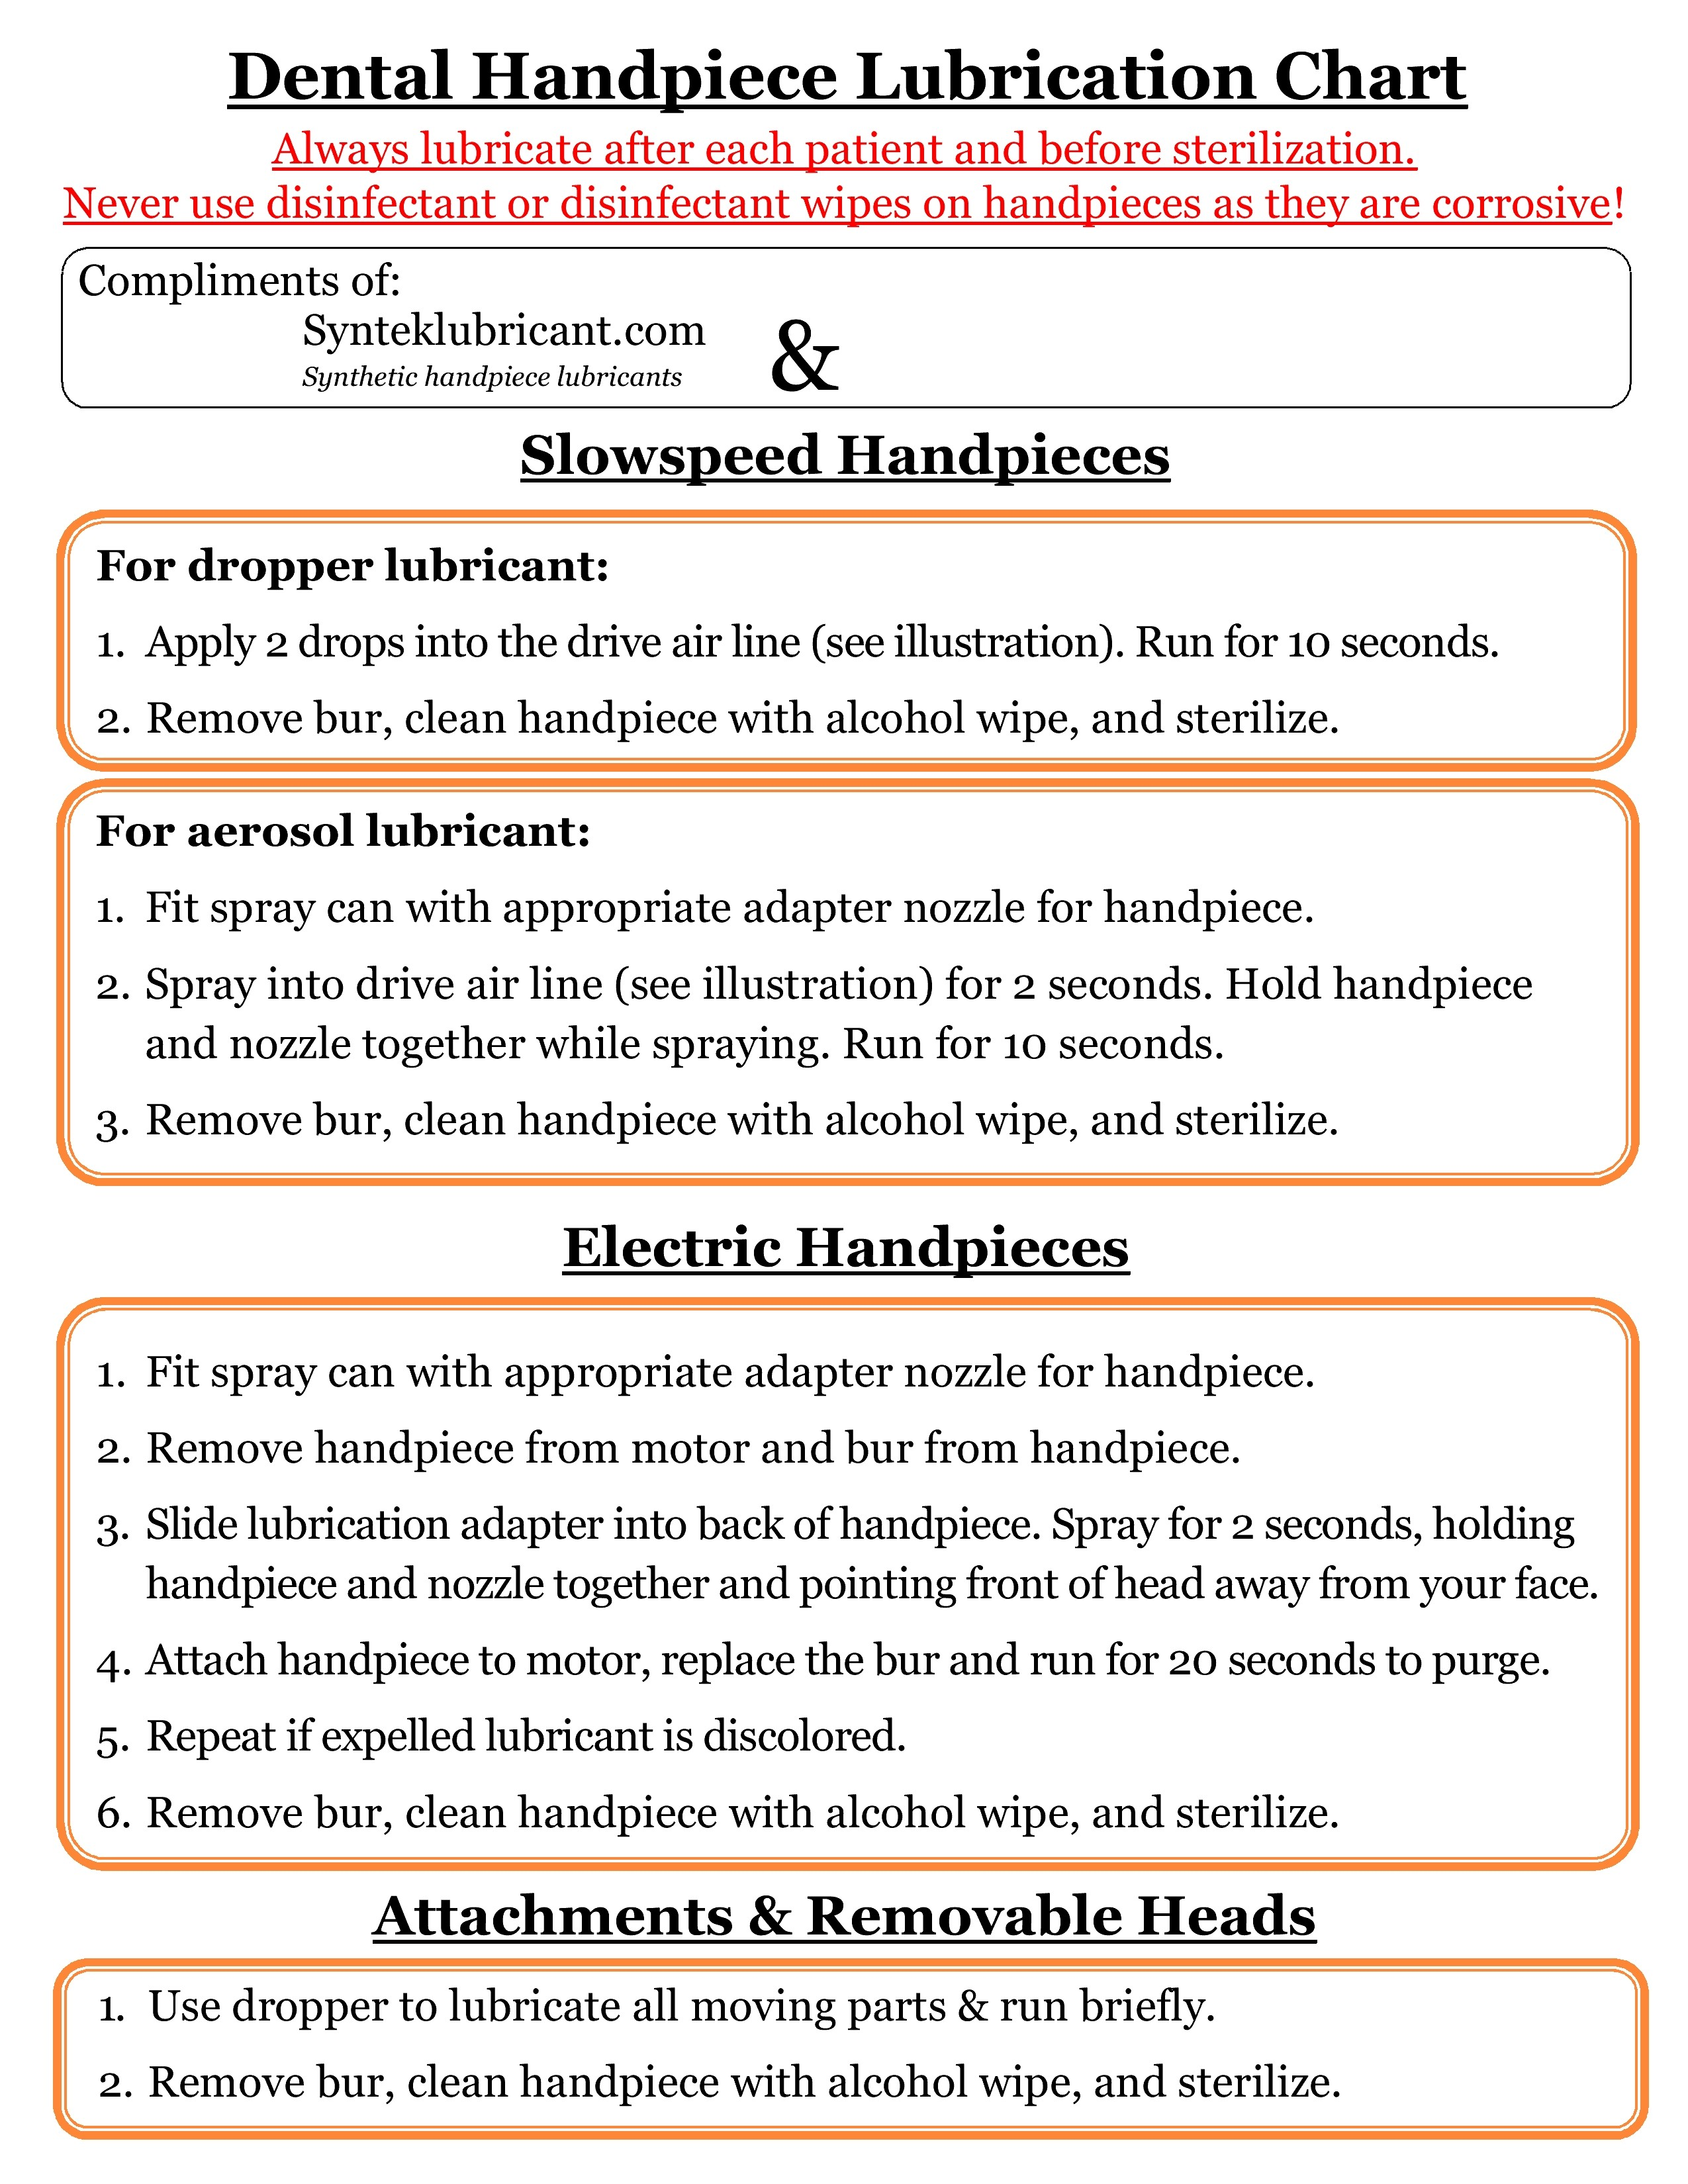 handpiece-lubrication-chart-2-002.jpg